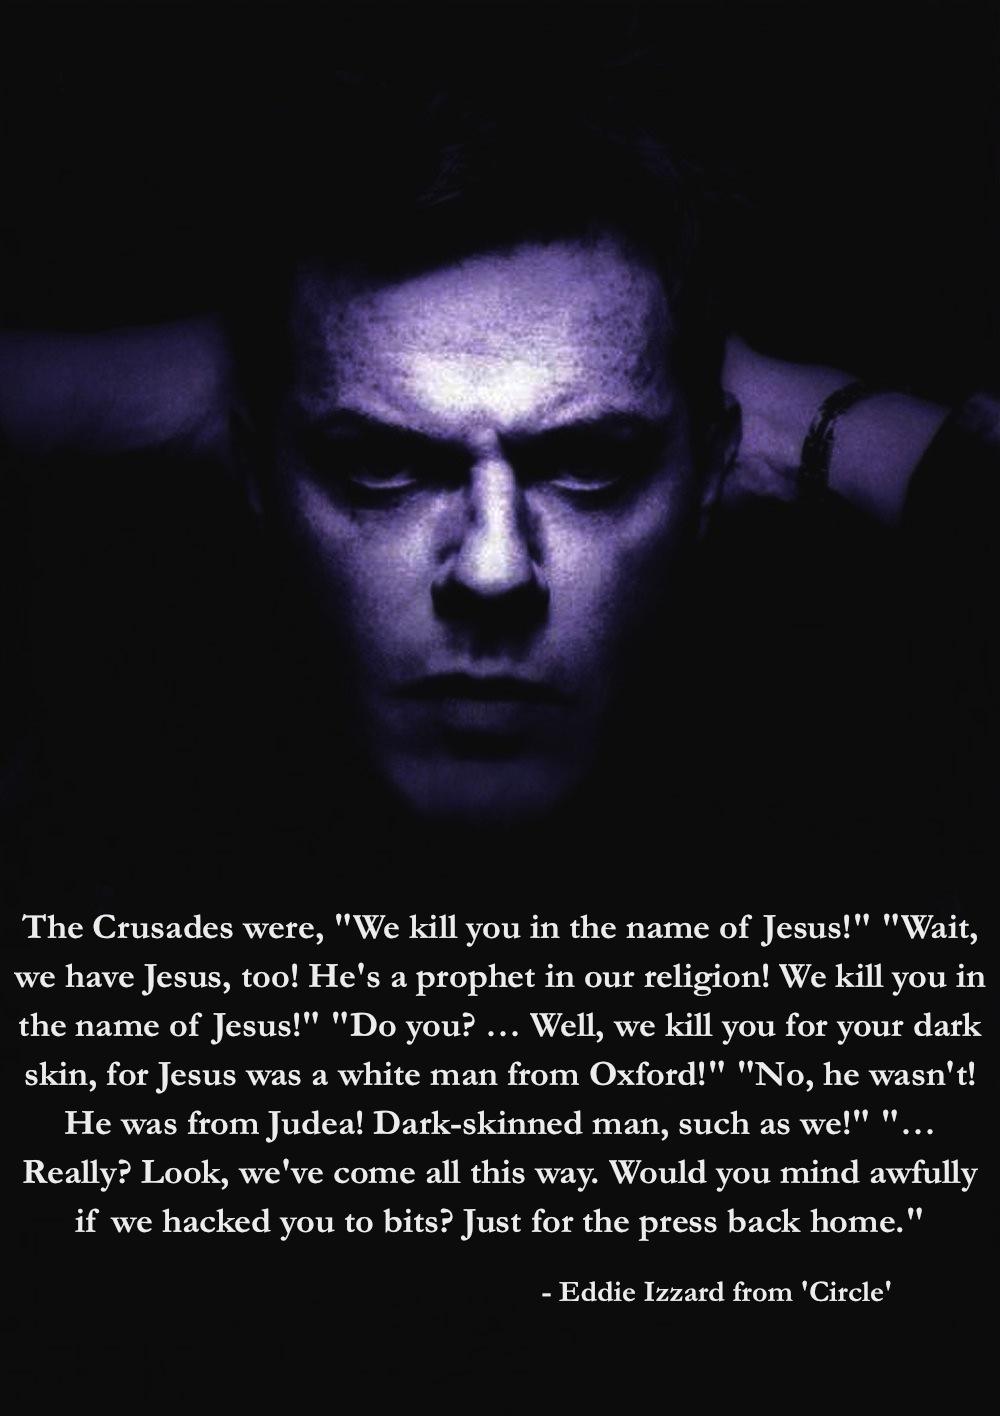 Eddie Izzard's quote #3